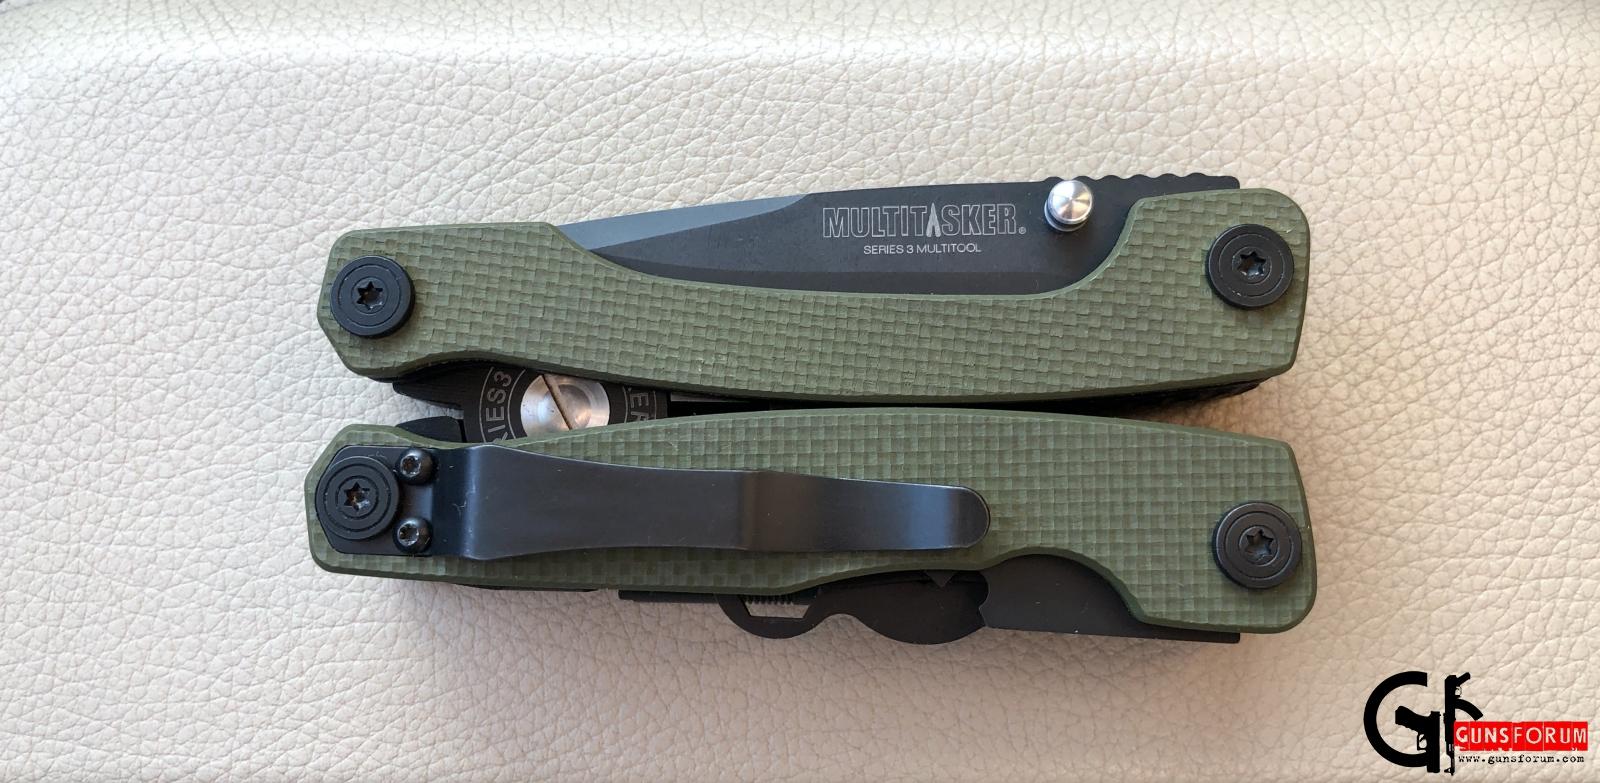 Мультитул для AR - Multitasker Series 3 AR-15 M4 Tool